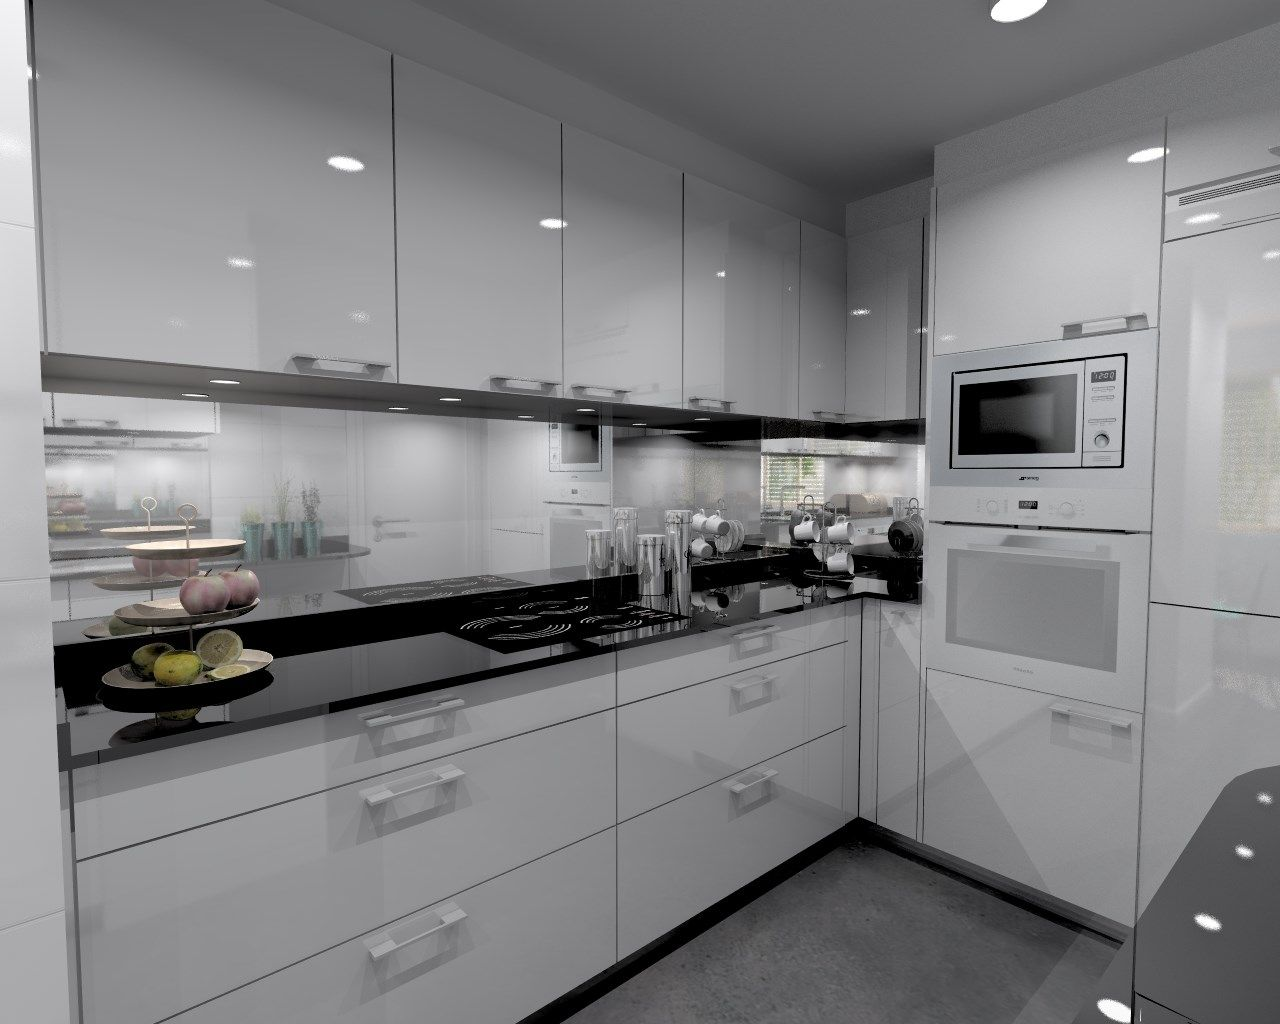 Cocina santos modelo plano laminado blanco brillo con - Cocinas blancas con granito ...